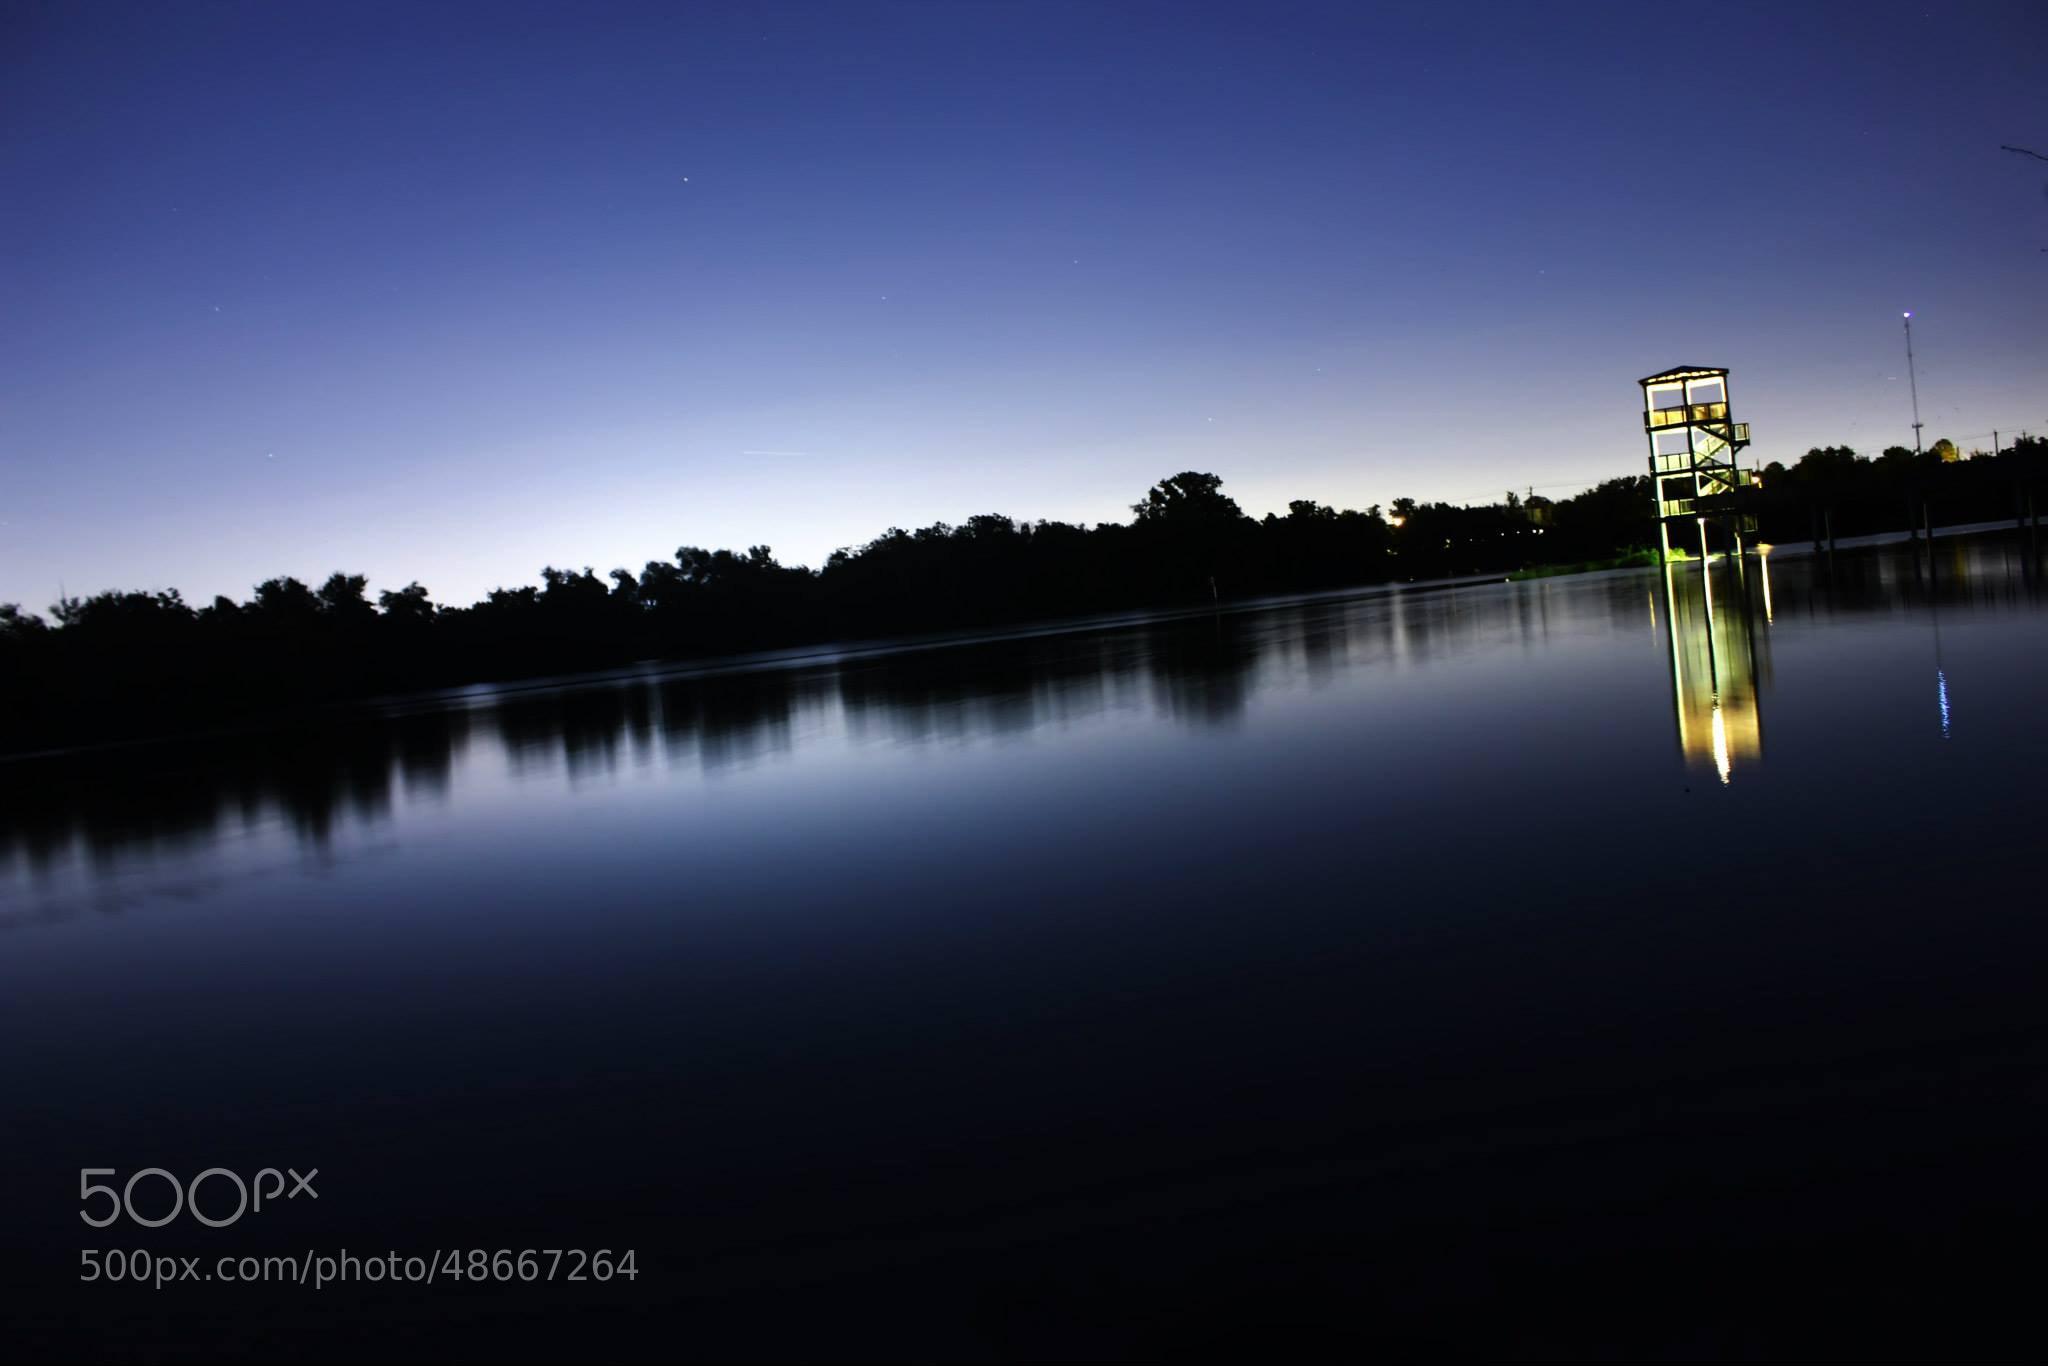 Photograph A beautiful night by Armando Gonzalez on 500px